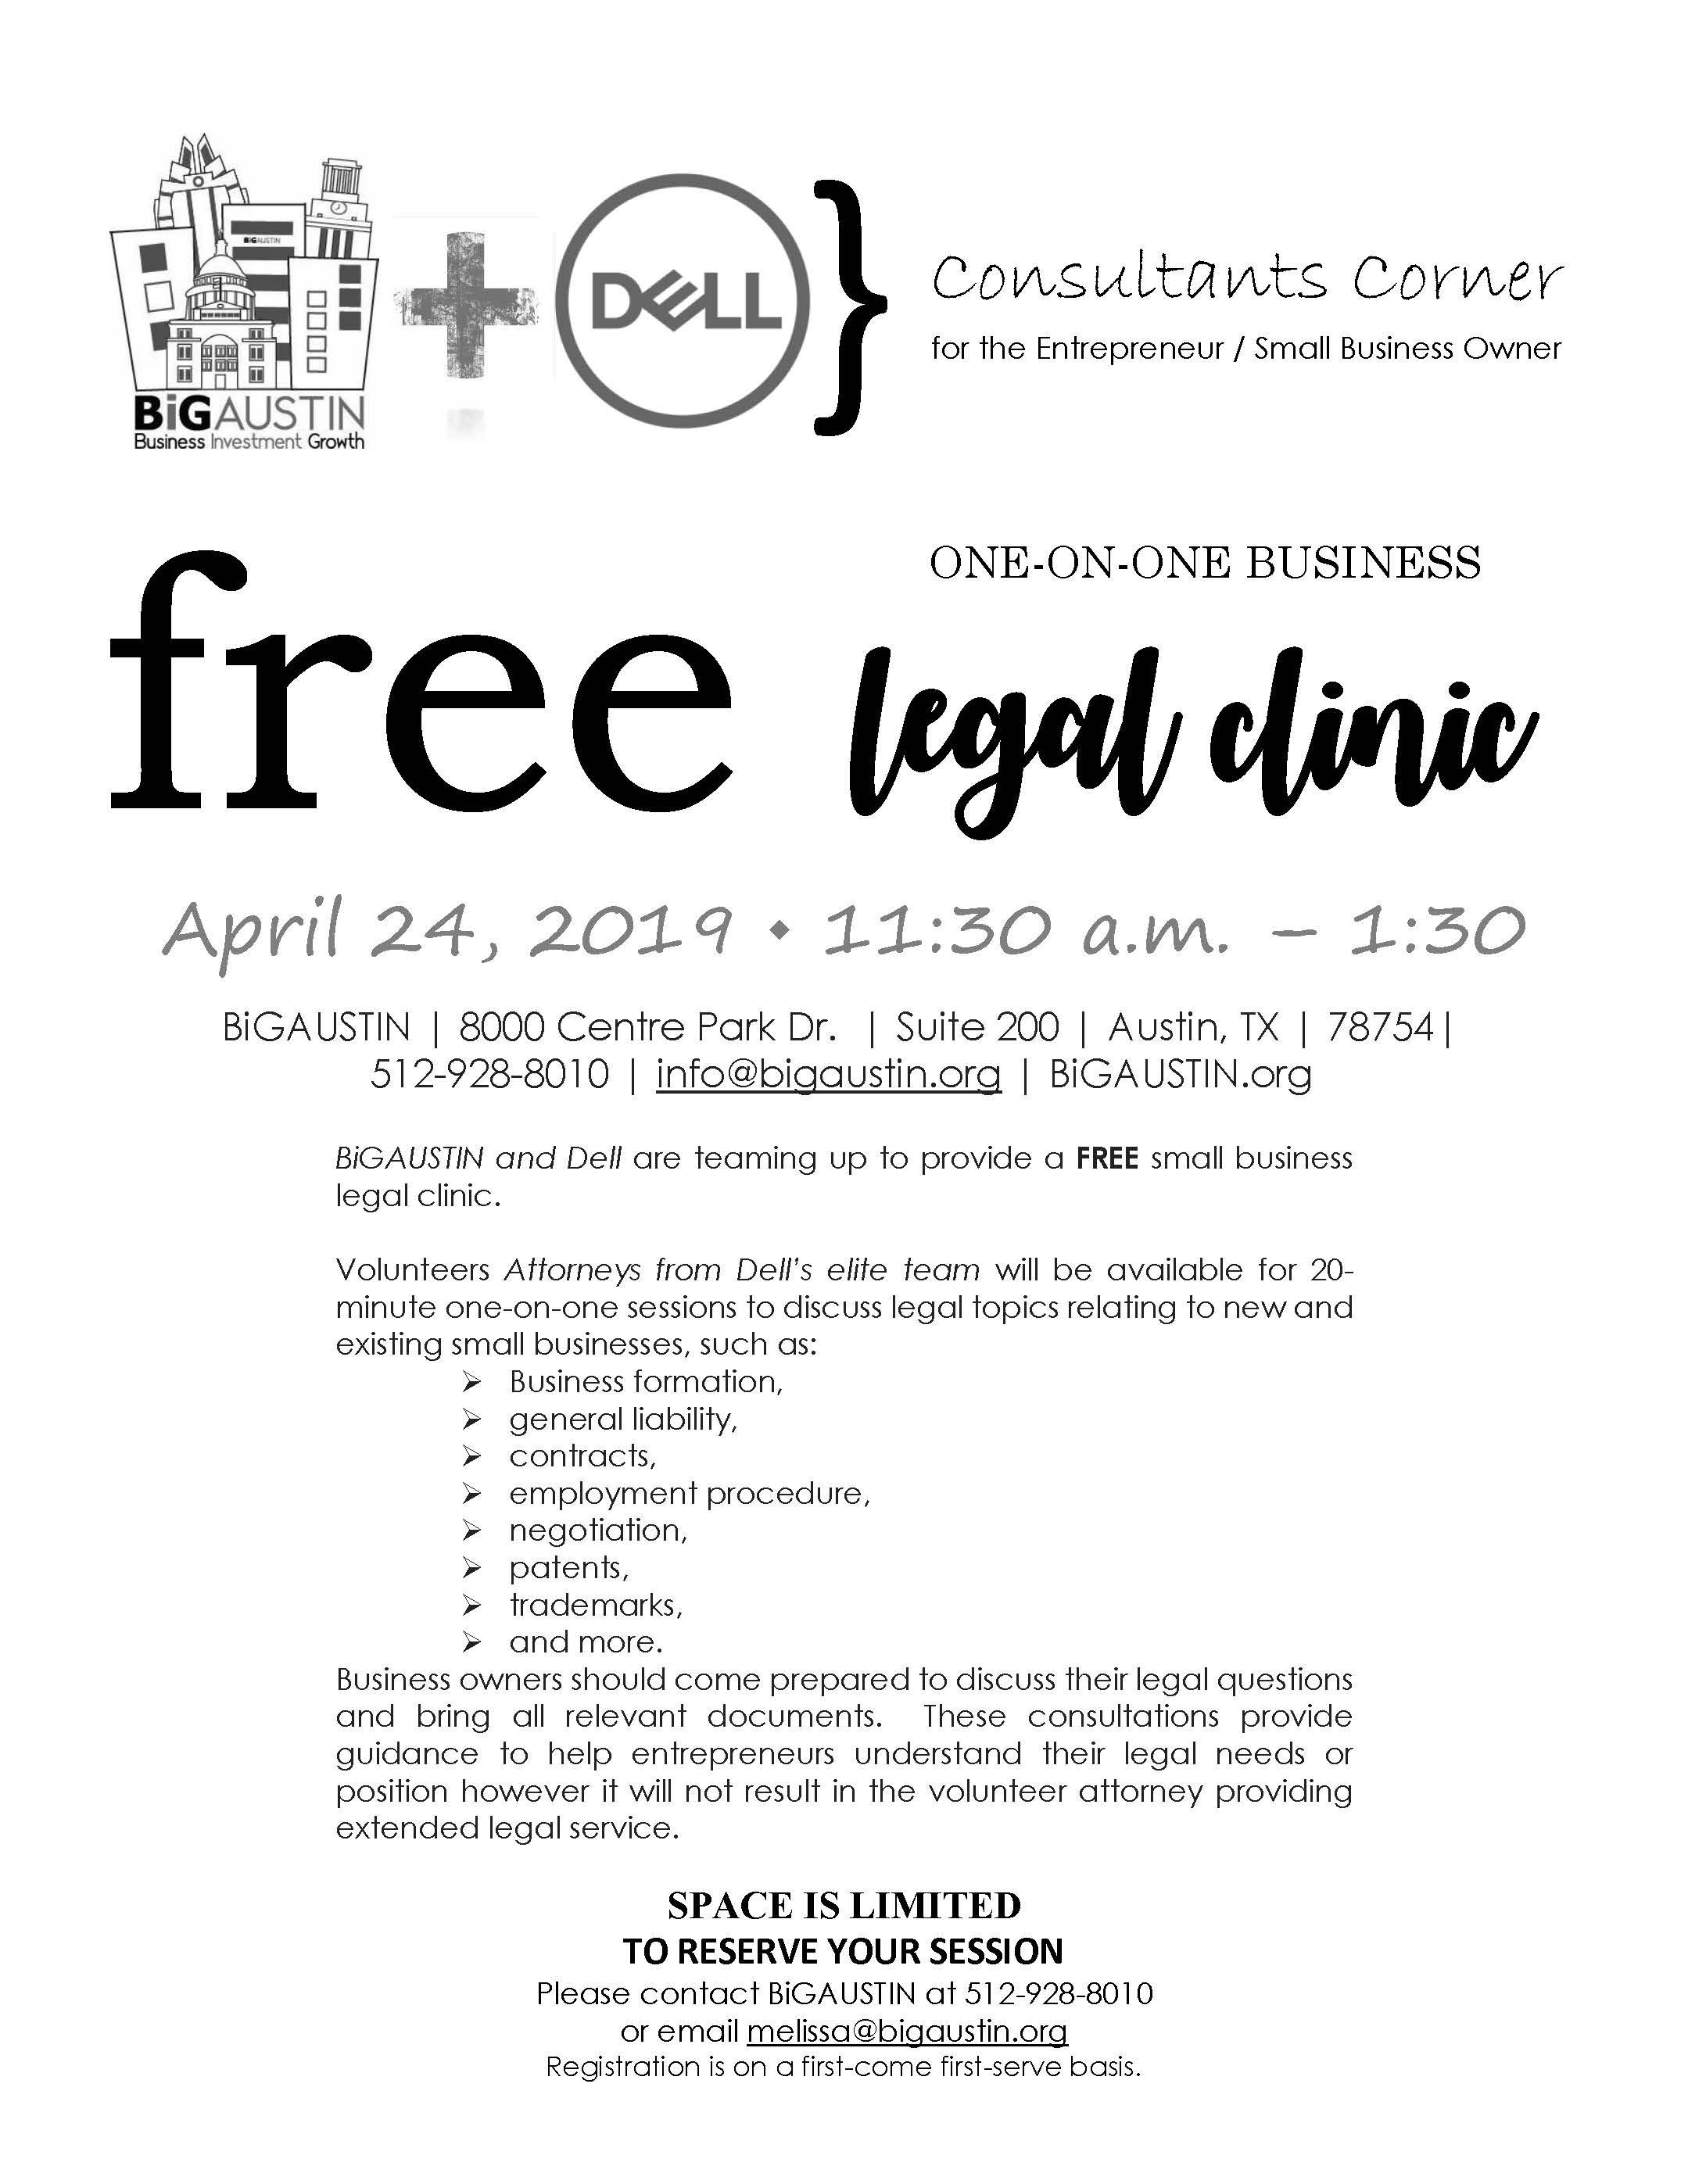 free legal clinic 04.24.19.jpg